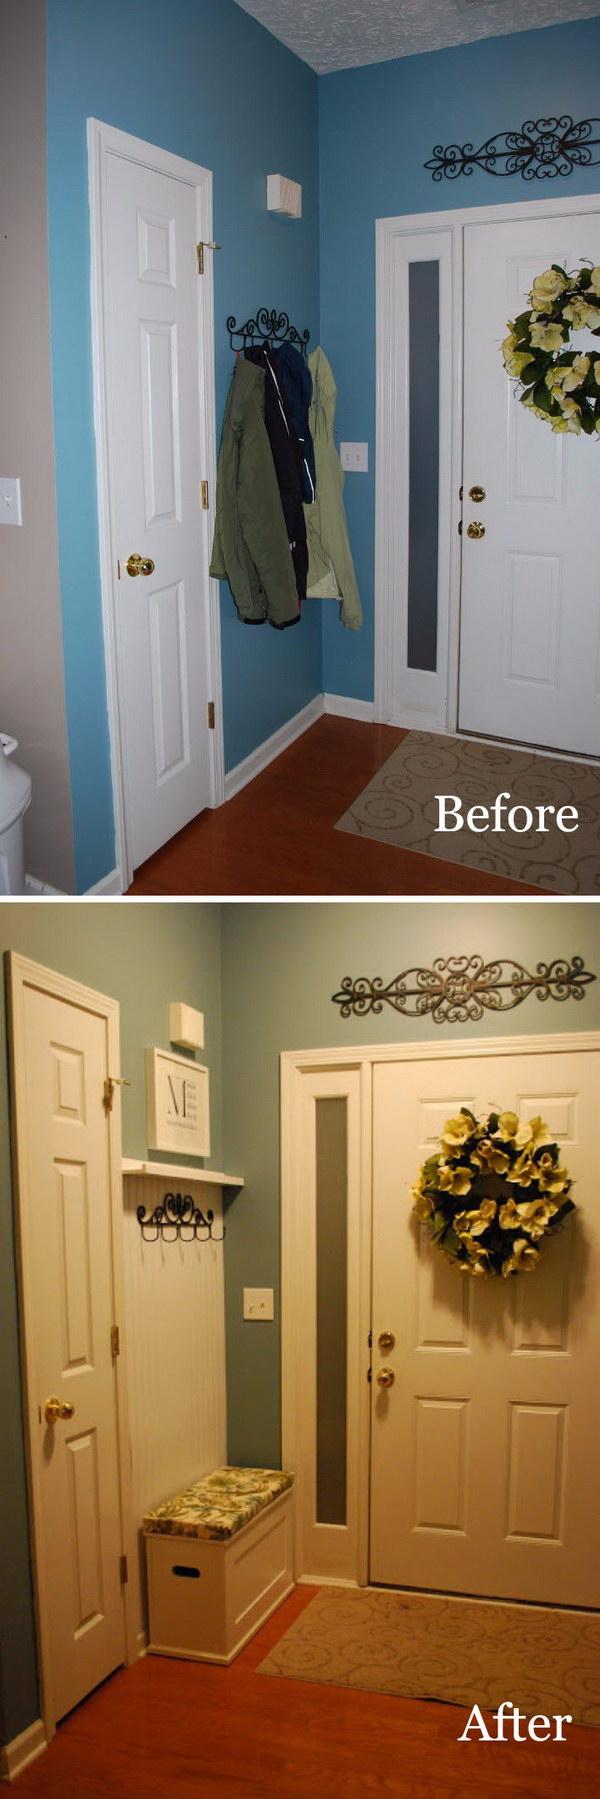 15 entryway makeover diy ideas tutorials - 30+ DIY Ideas to Give a Makeover to a Your Entryway